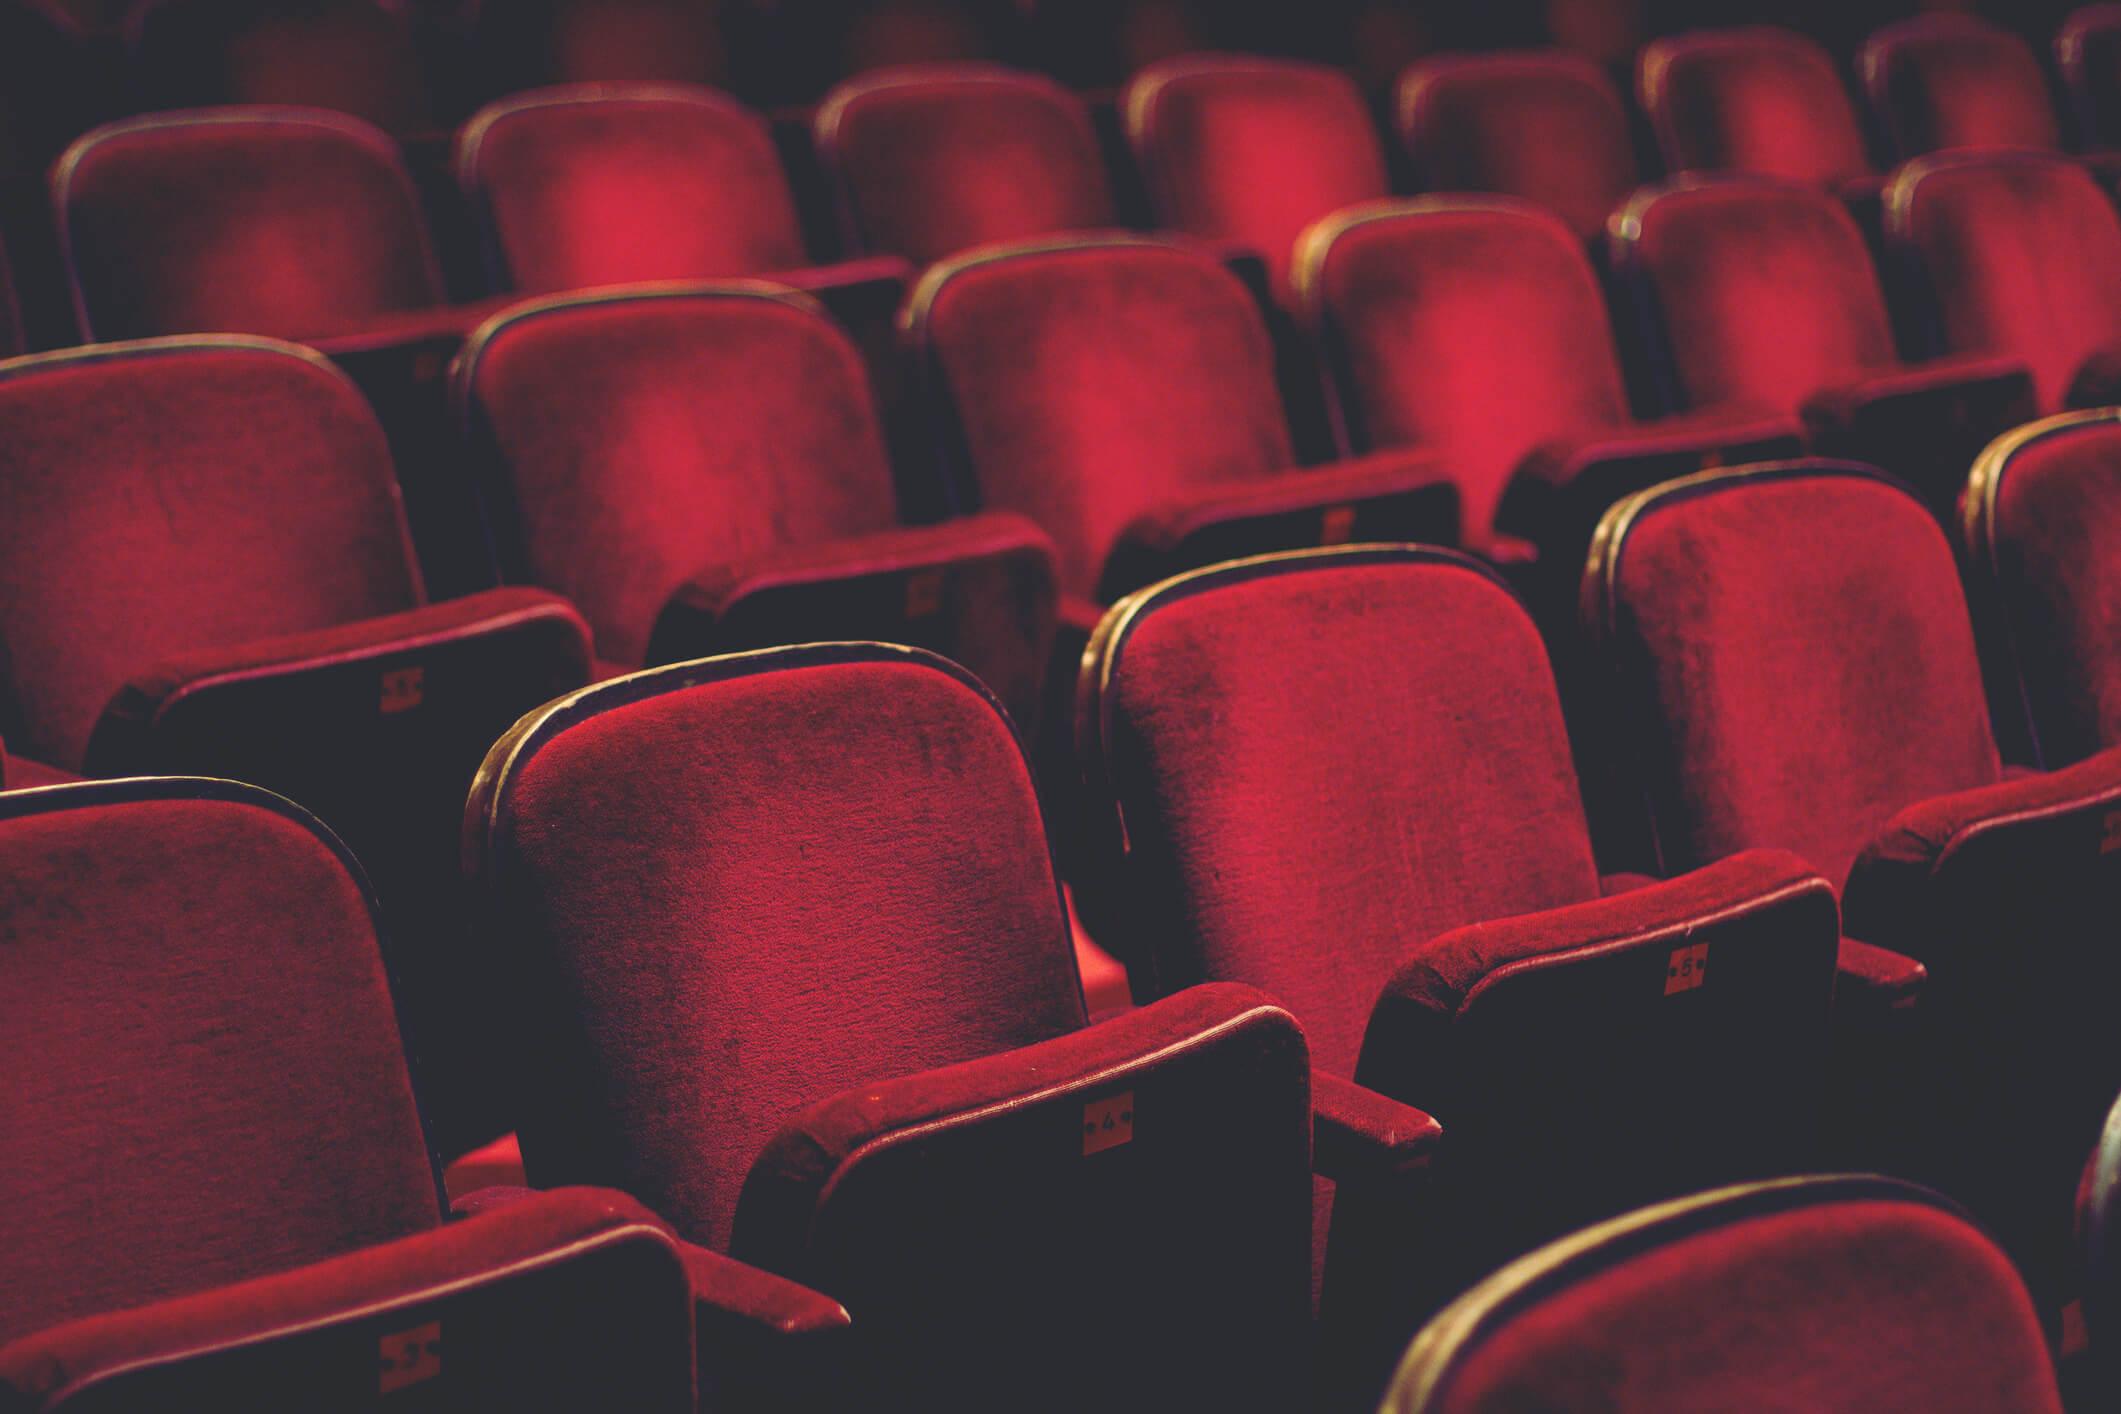 Empty red theatre seats